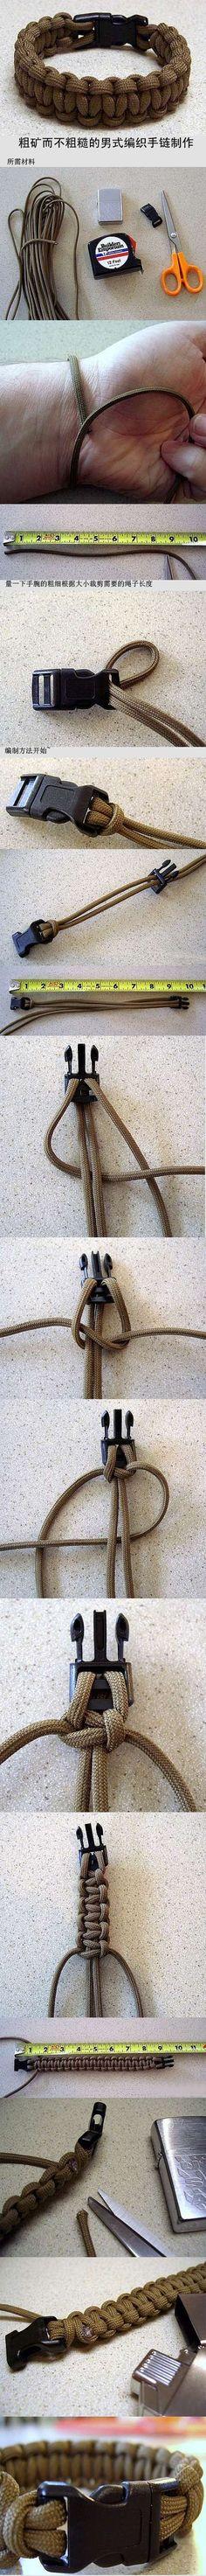 Tendance Bracelets  粗狂而不粗_来自totogirl的图片分享-堆糖网